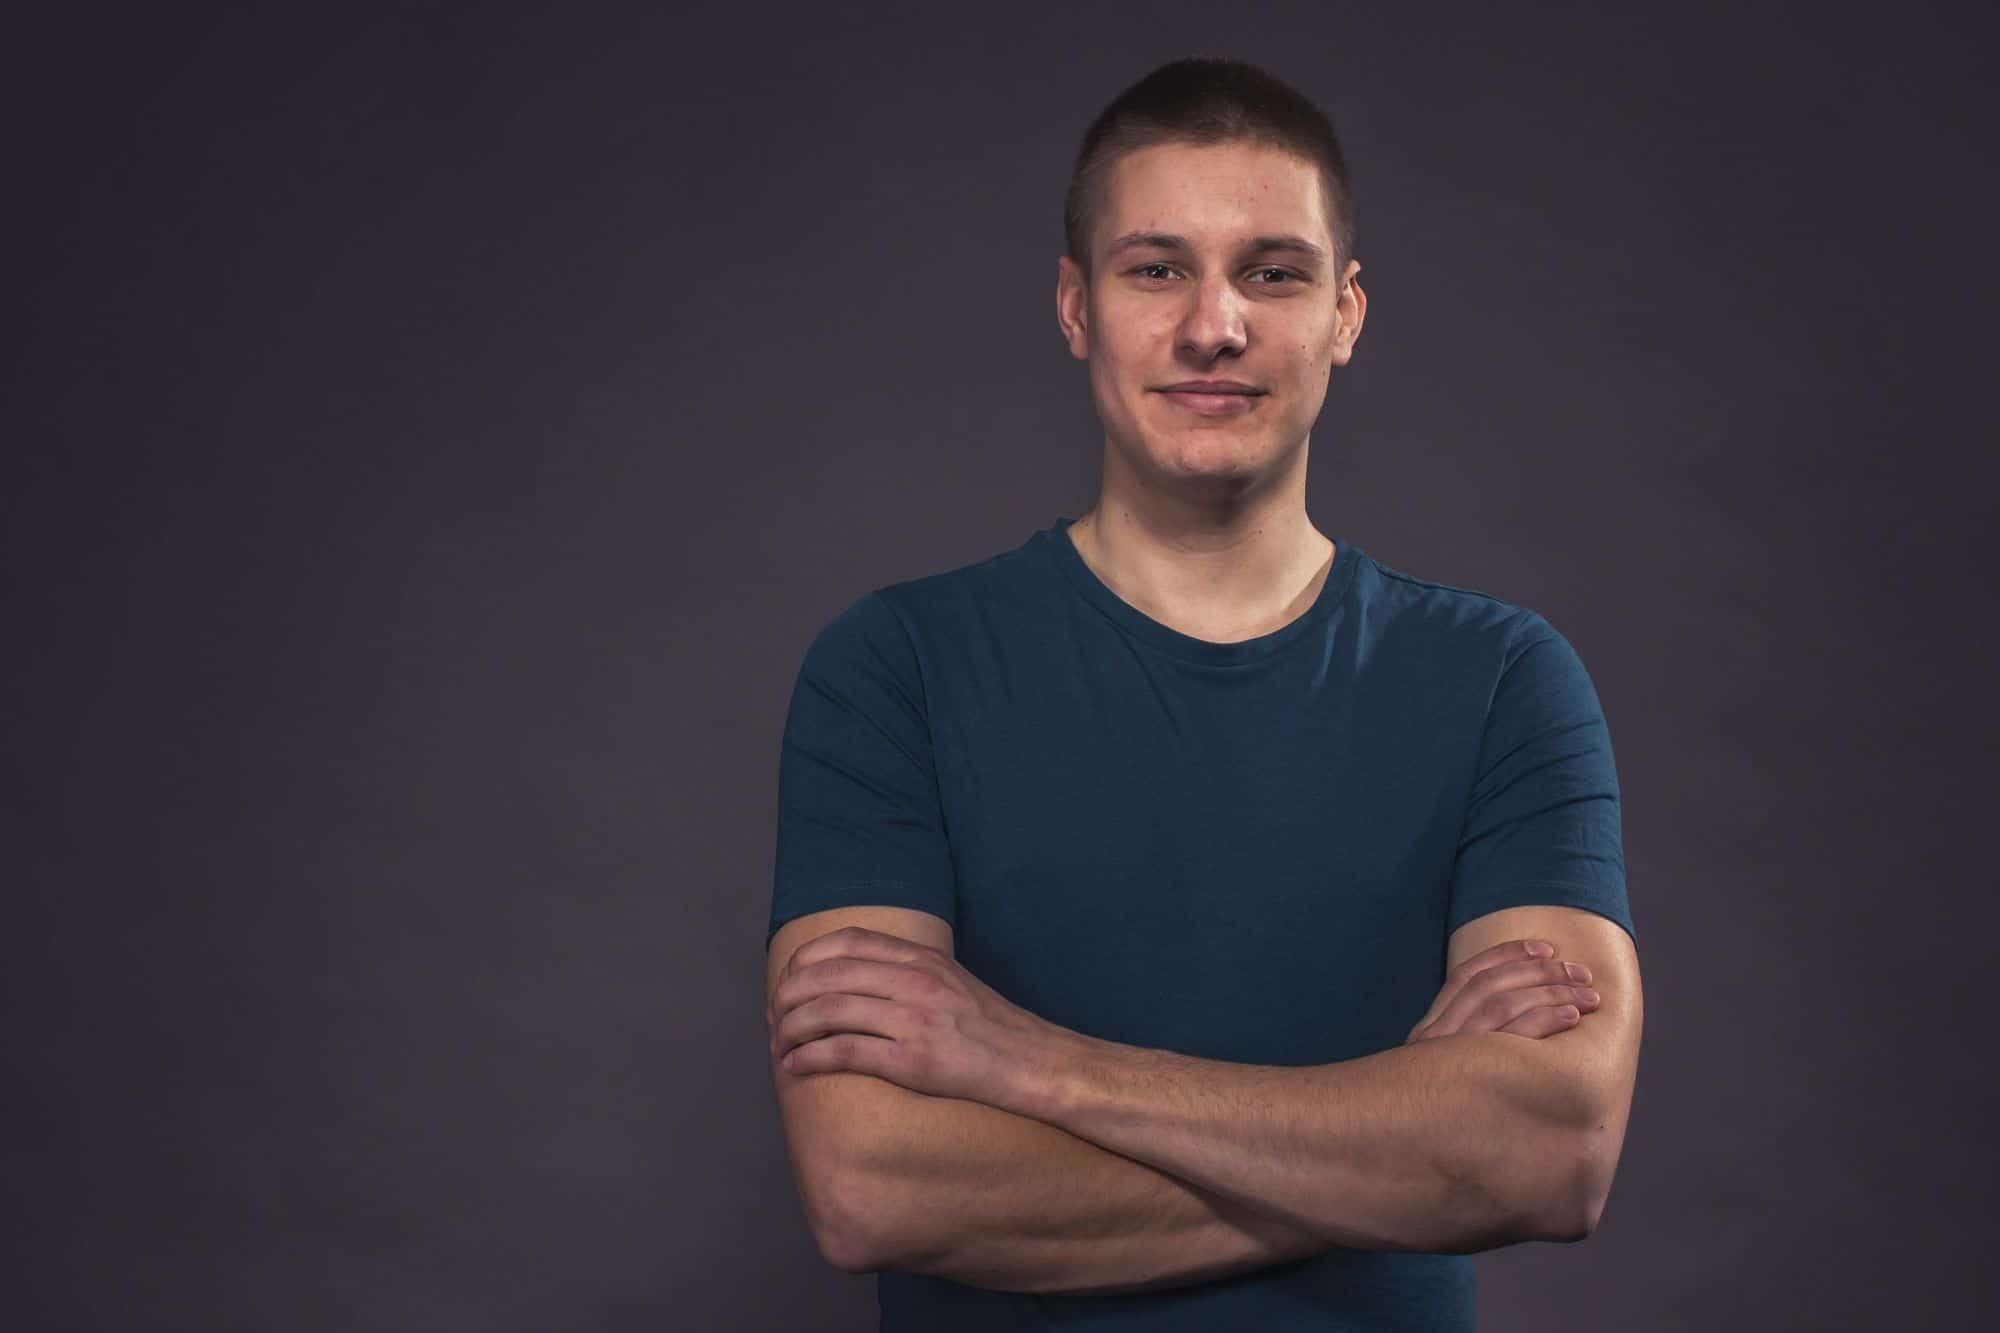 Jirka Slischka